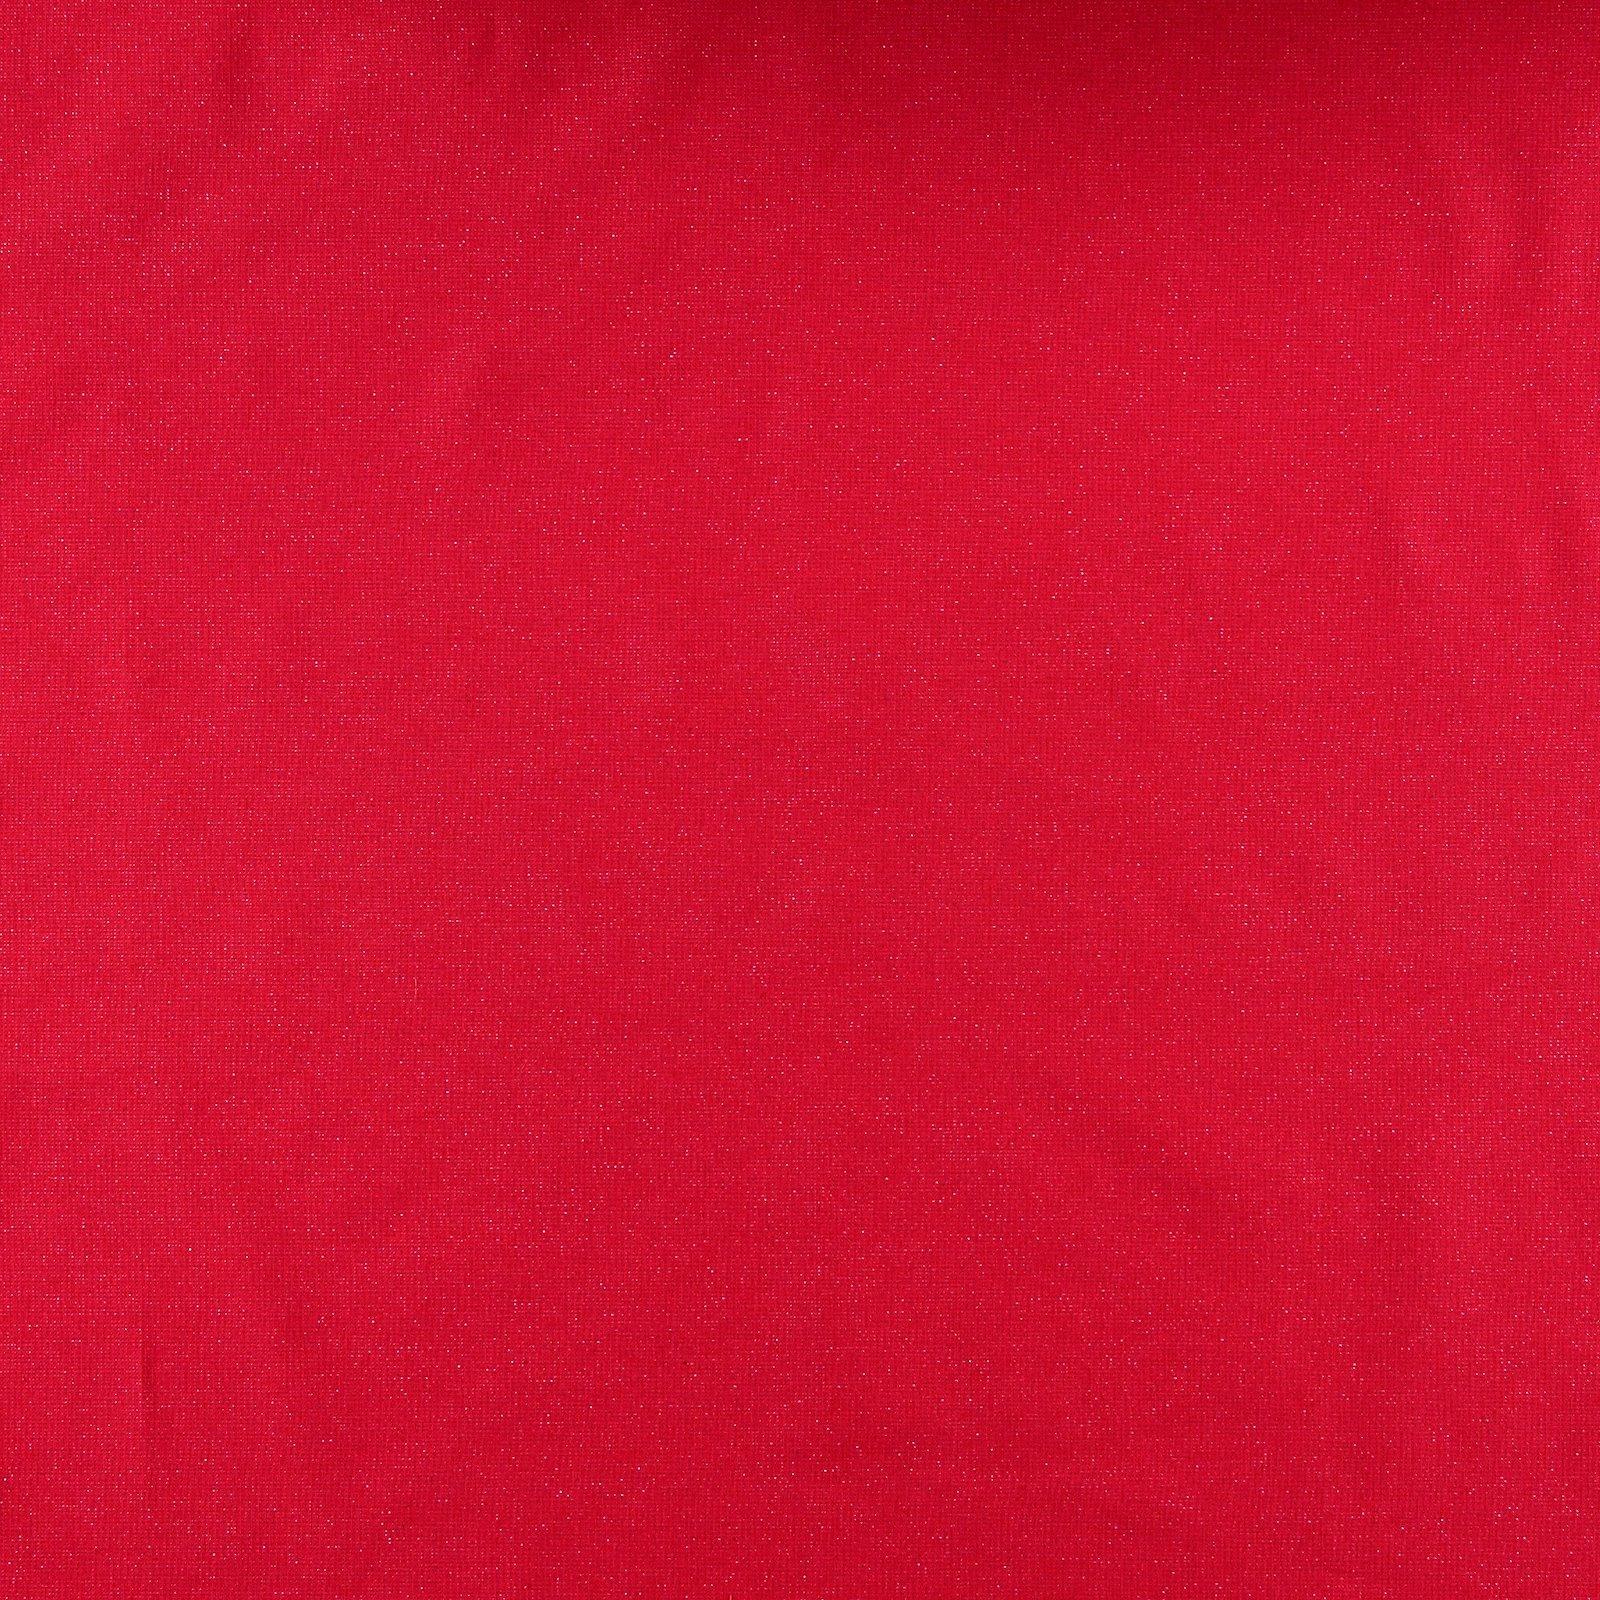 Woven red w silver lurex